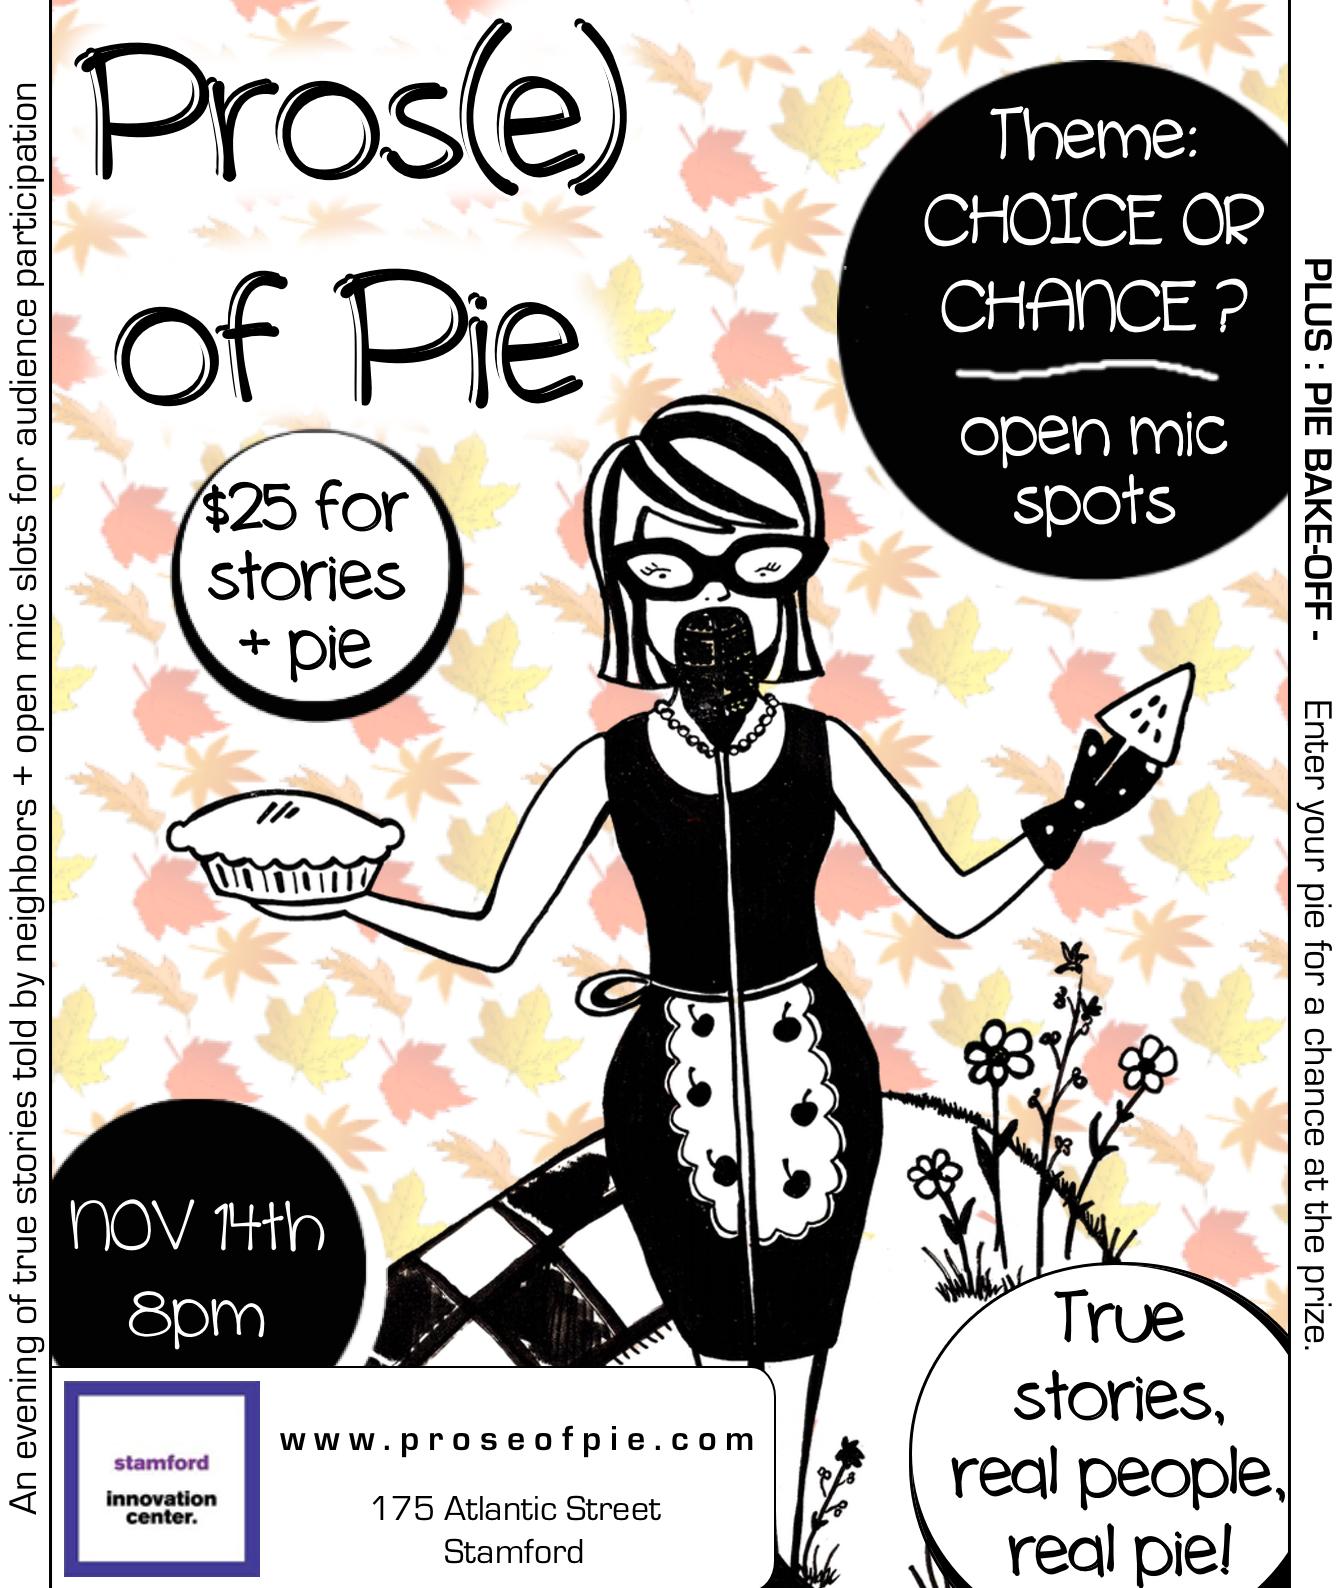 Prose of Pie Poster